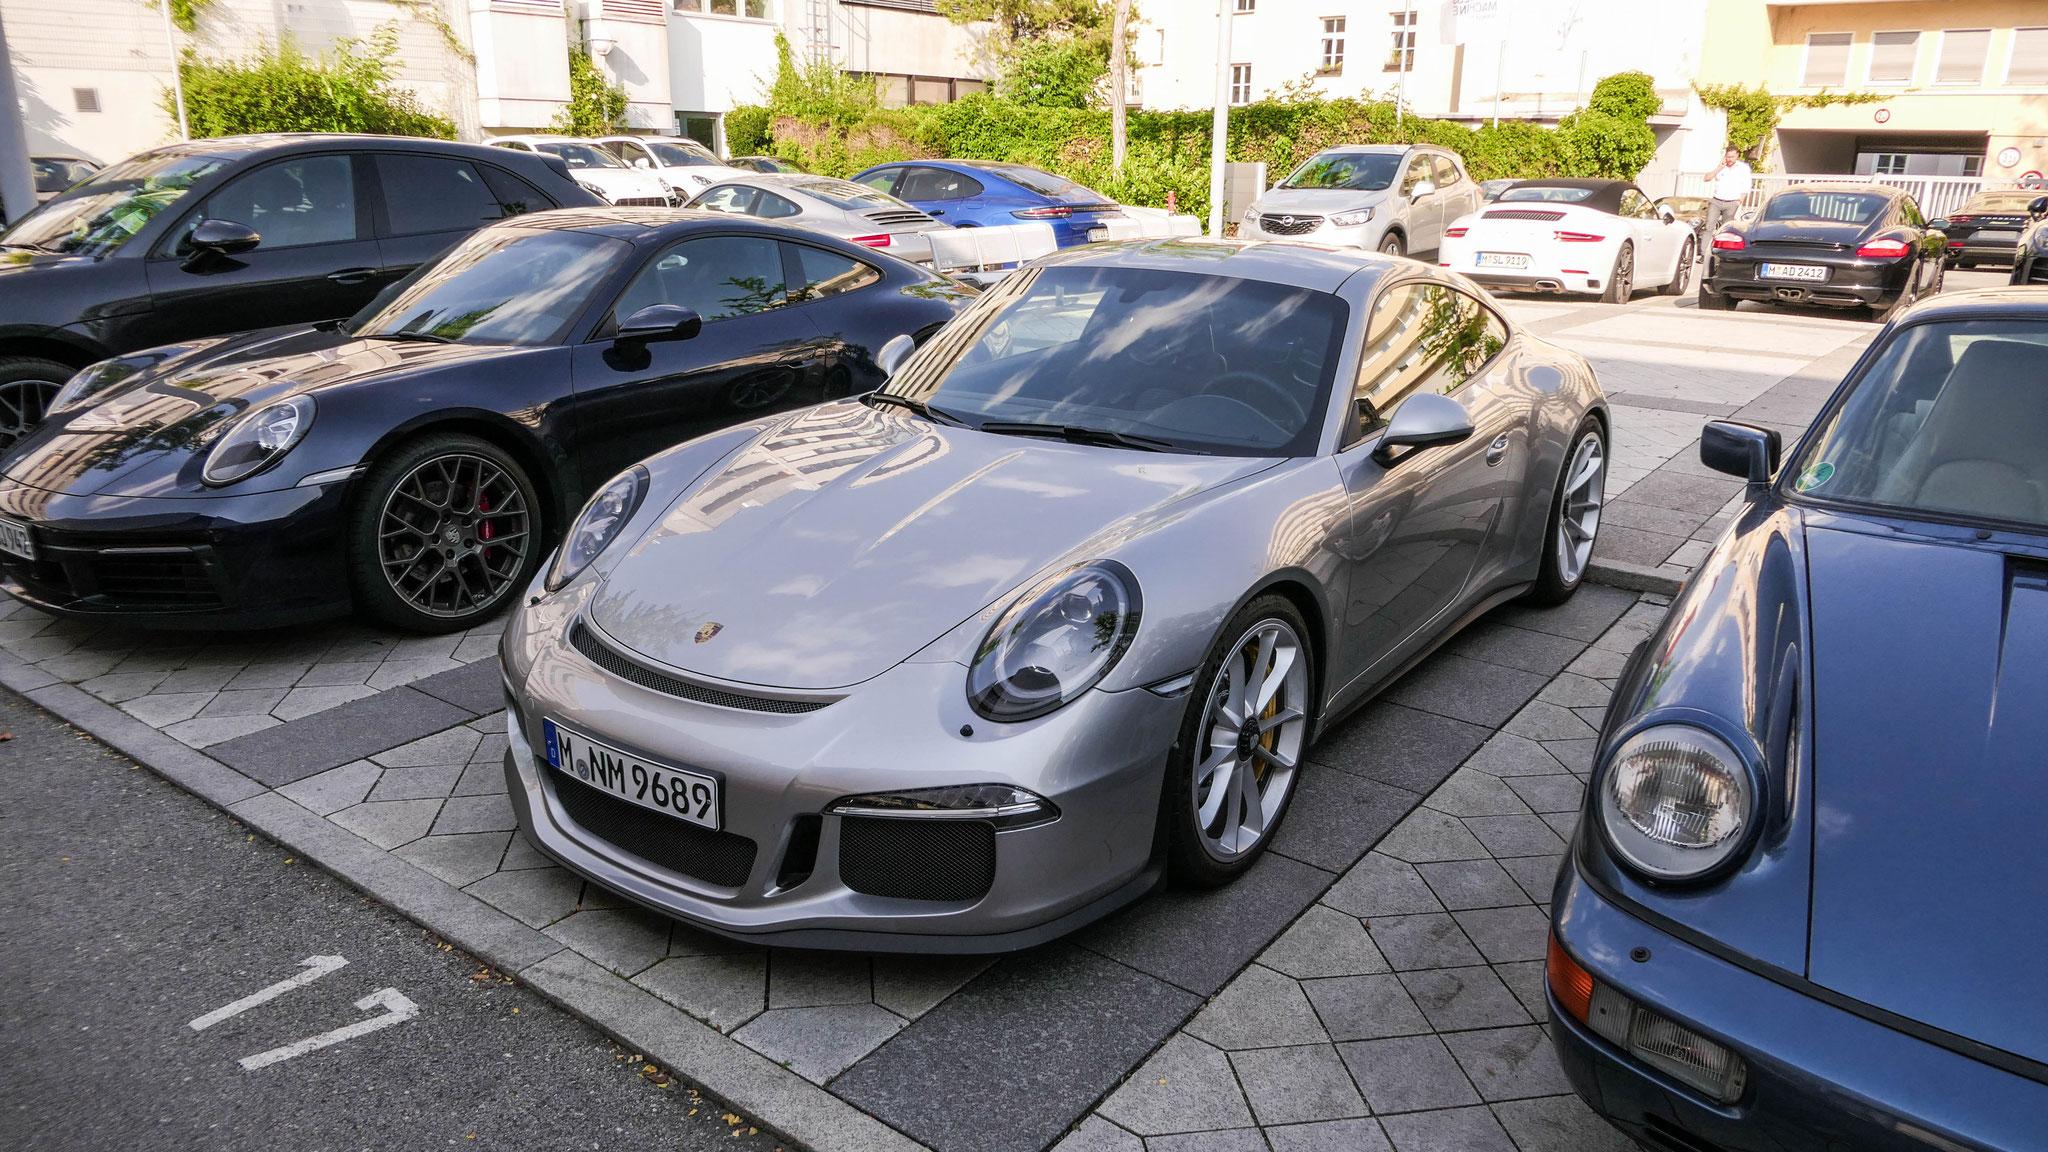 Porsche 911 R - M-NM-9689